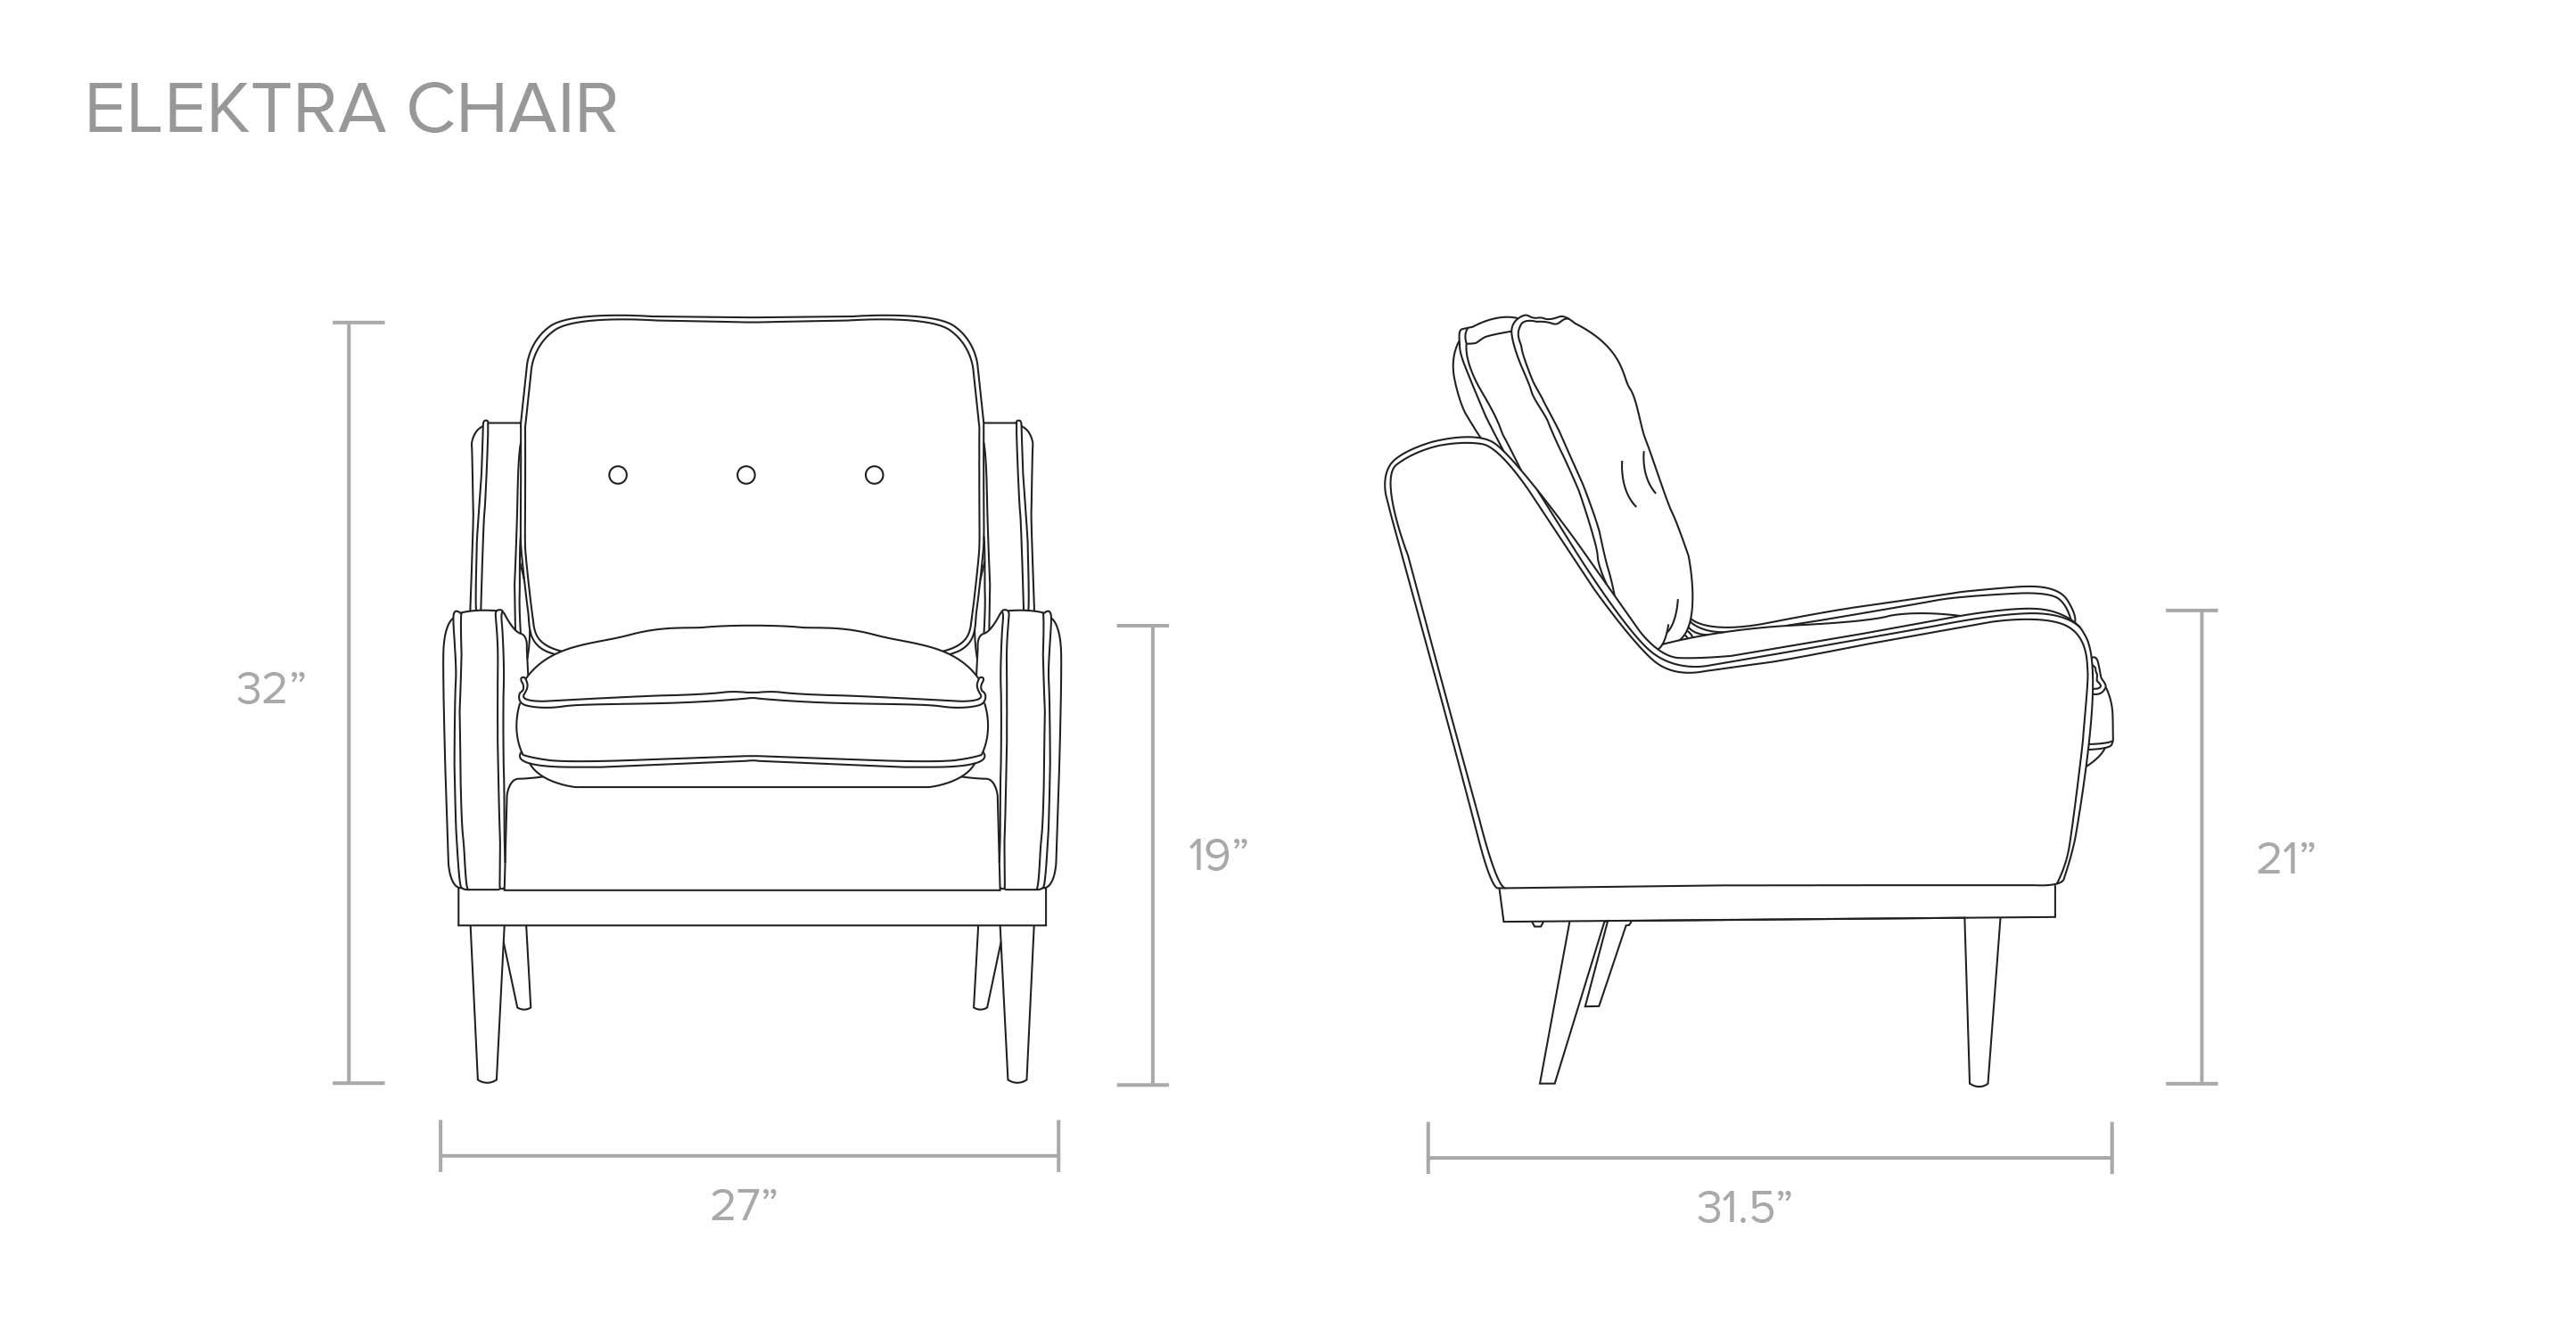 drawings-elektra1.jpg